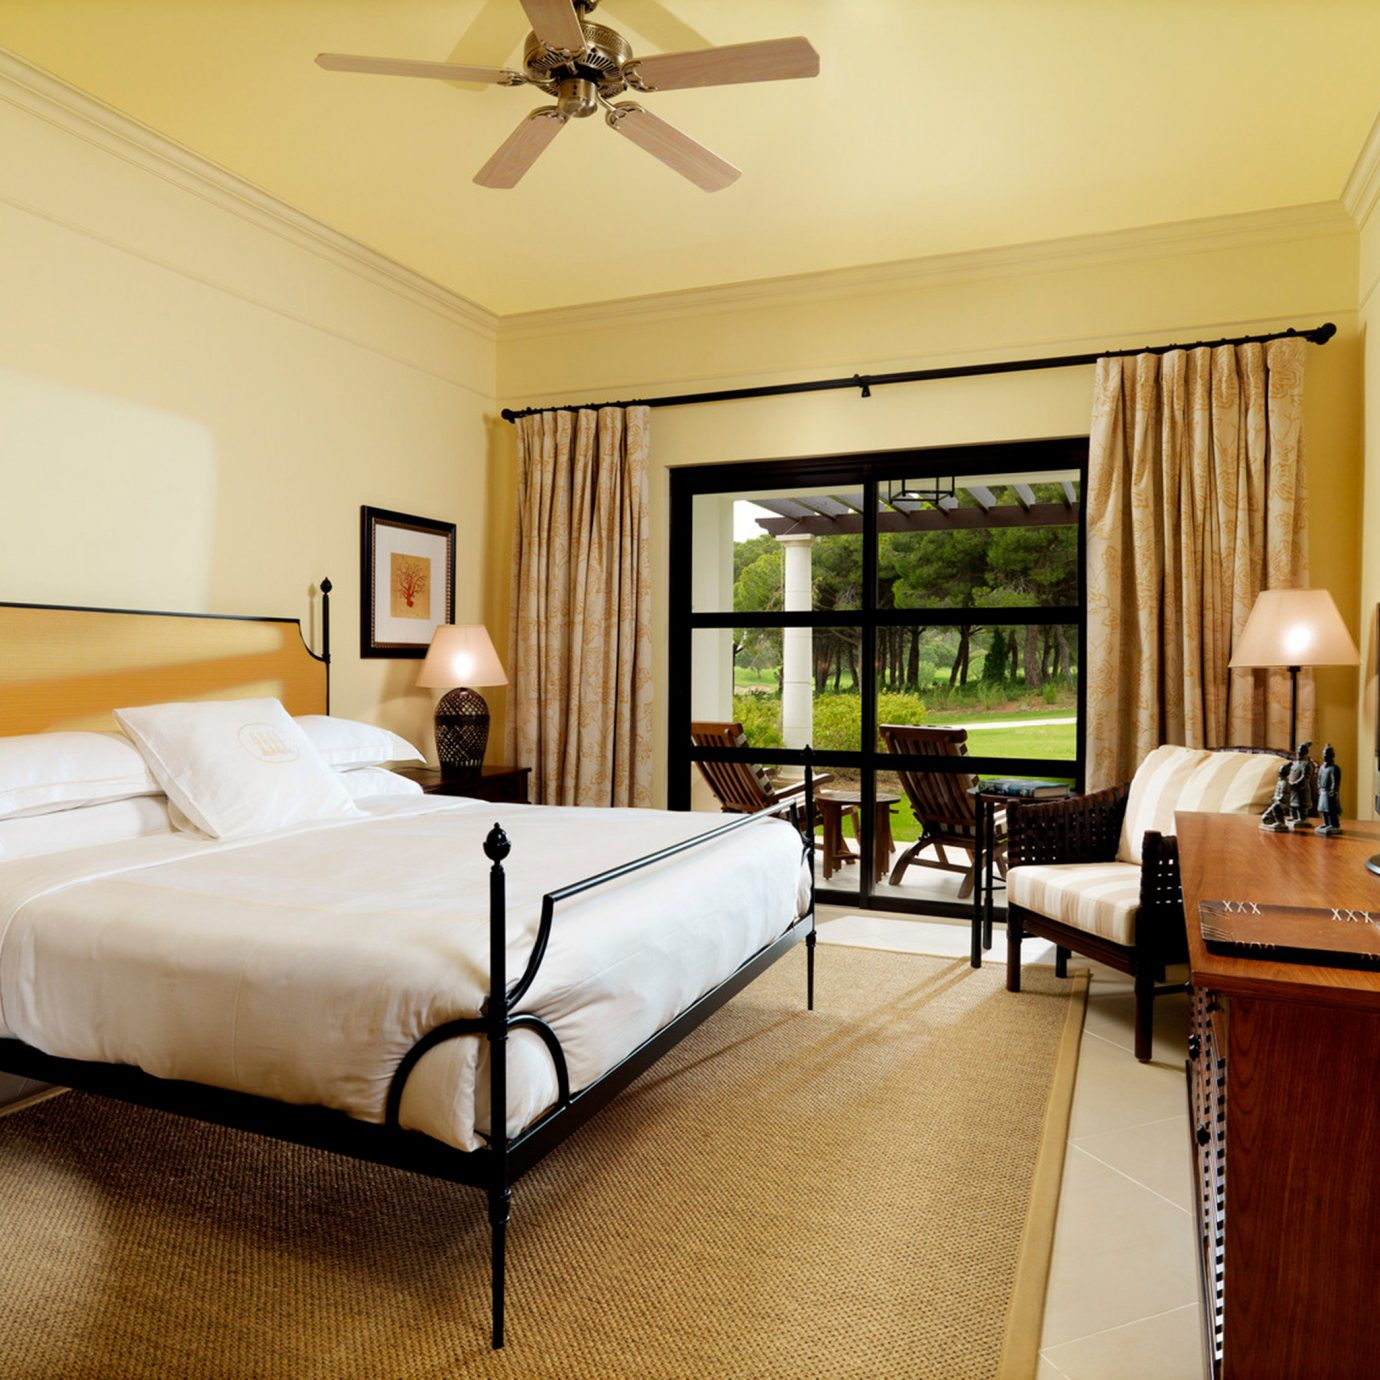 Balcony Bedroom Family Hotels Modern Patio Resort property living room Suite condominium home hardwood cottage Villa